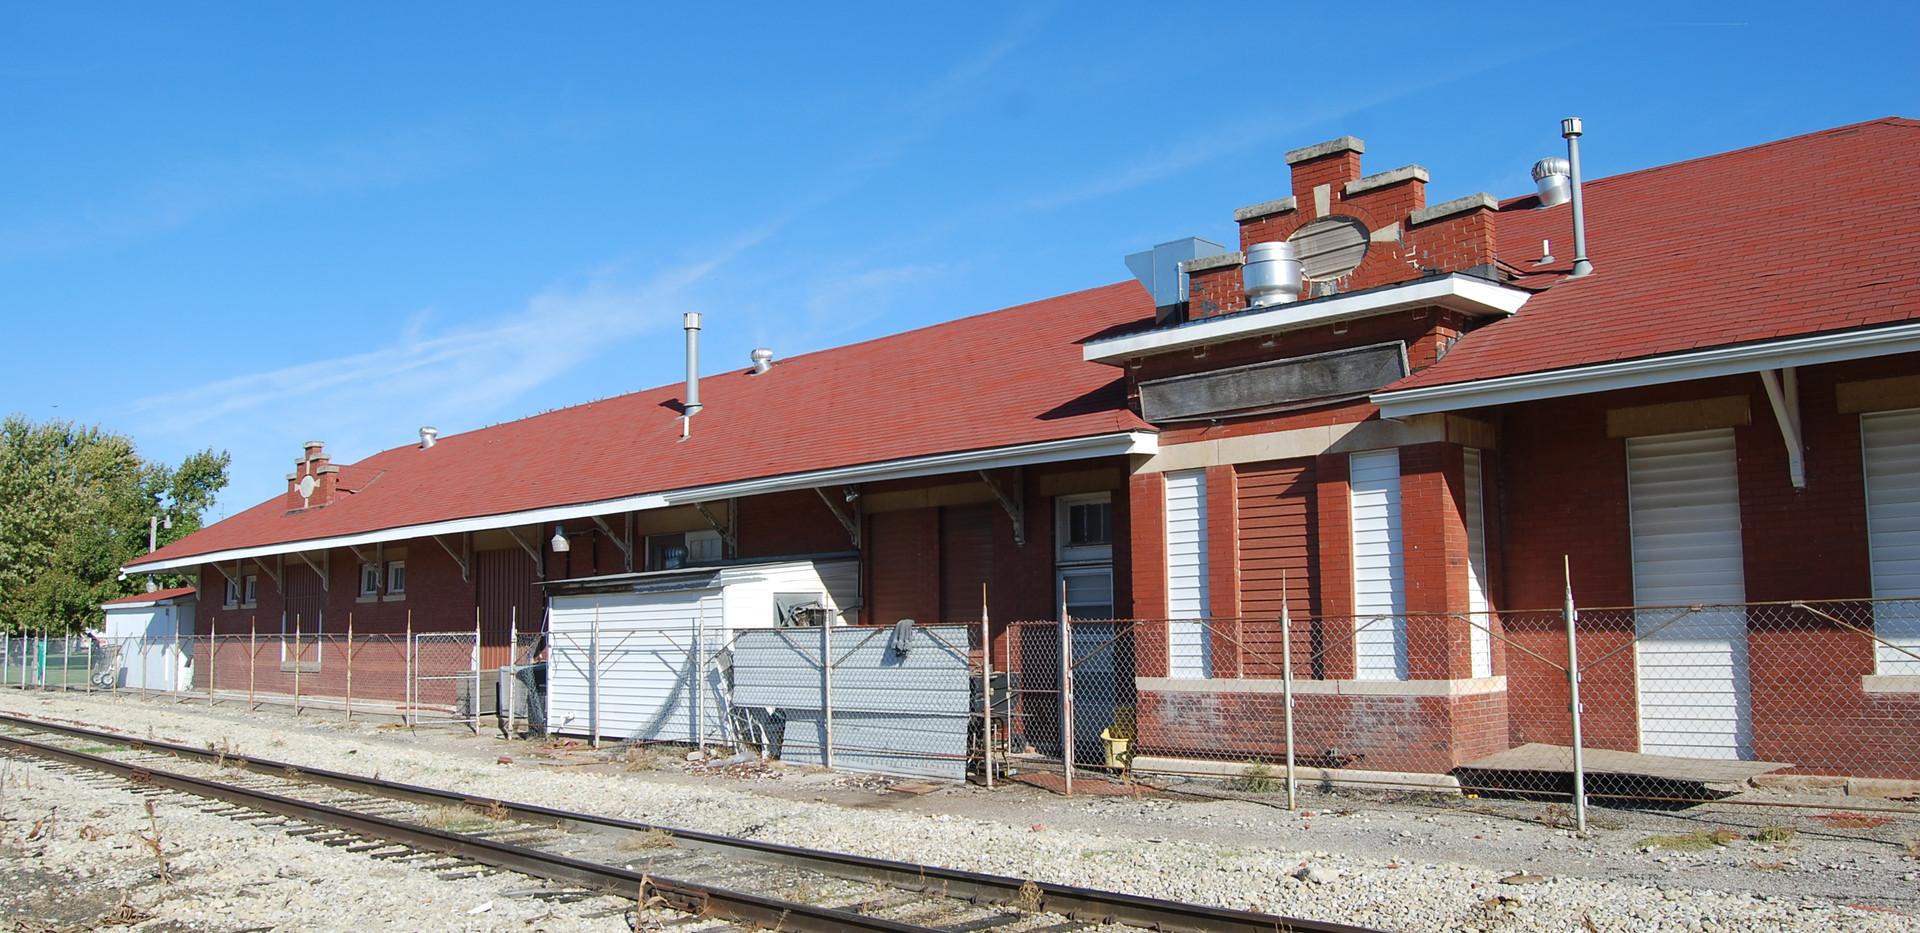 ATSF depot